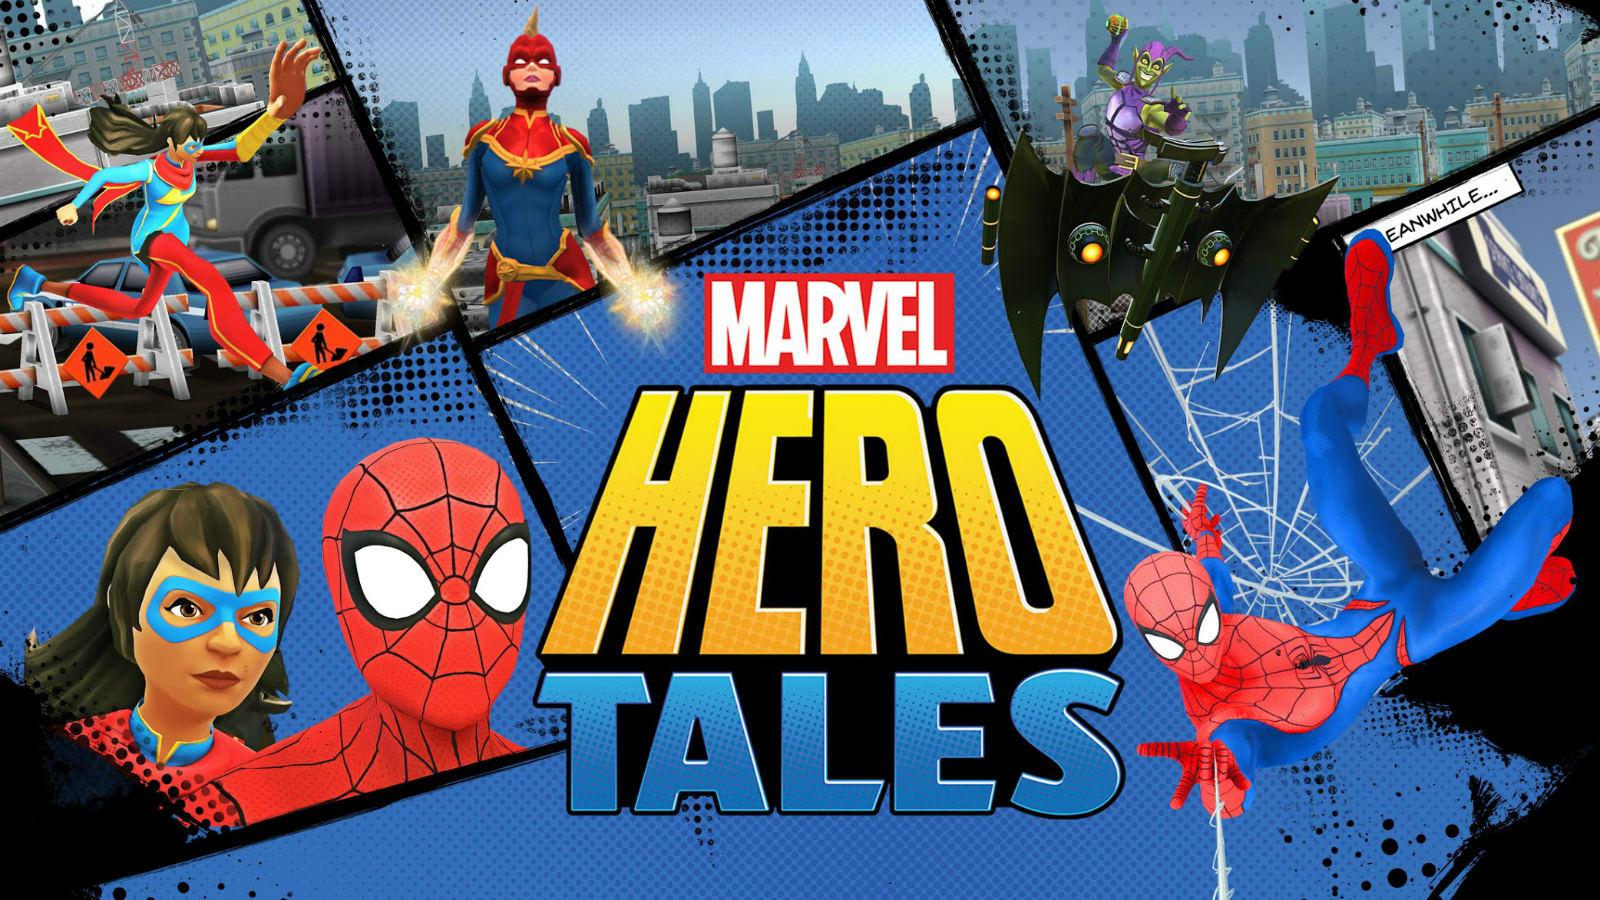 Literacy app taps Marvel comics to teach kids to read